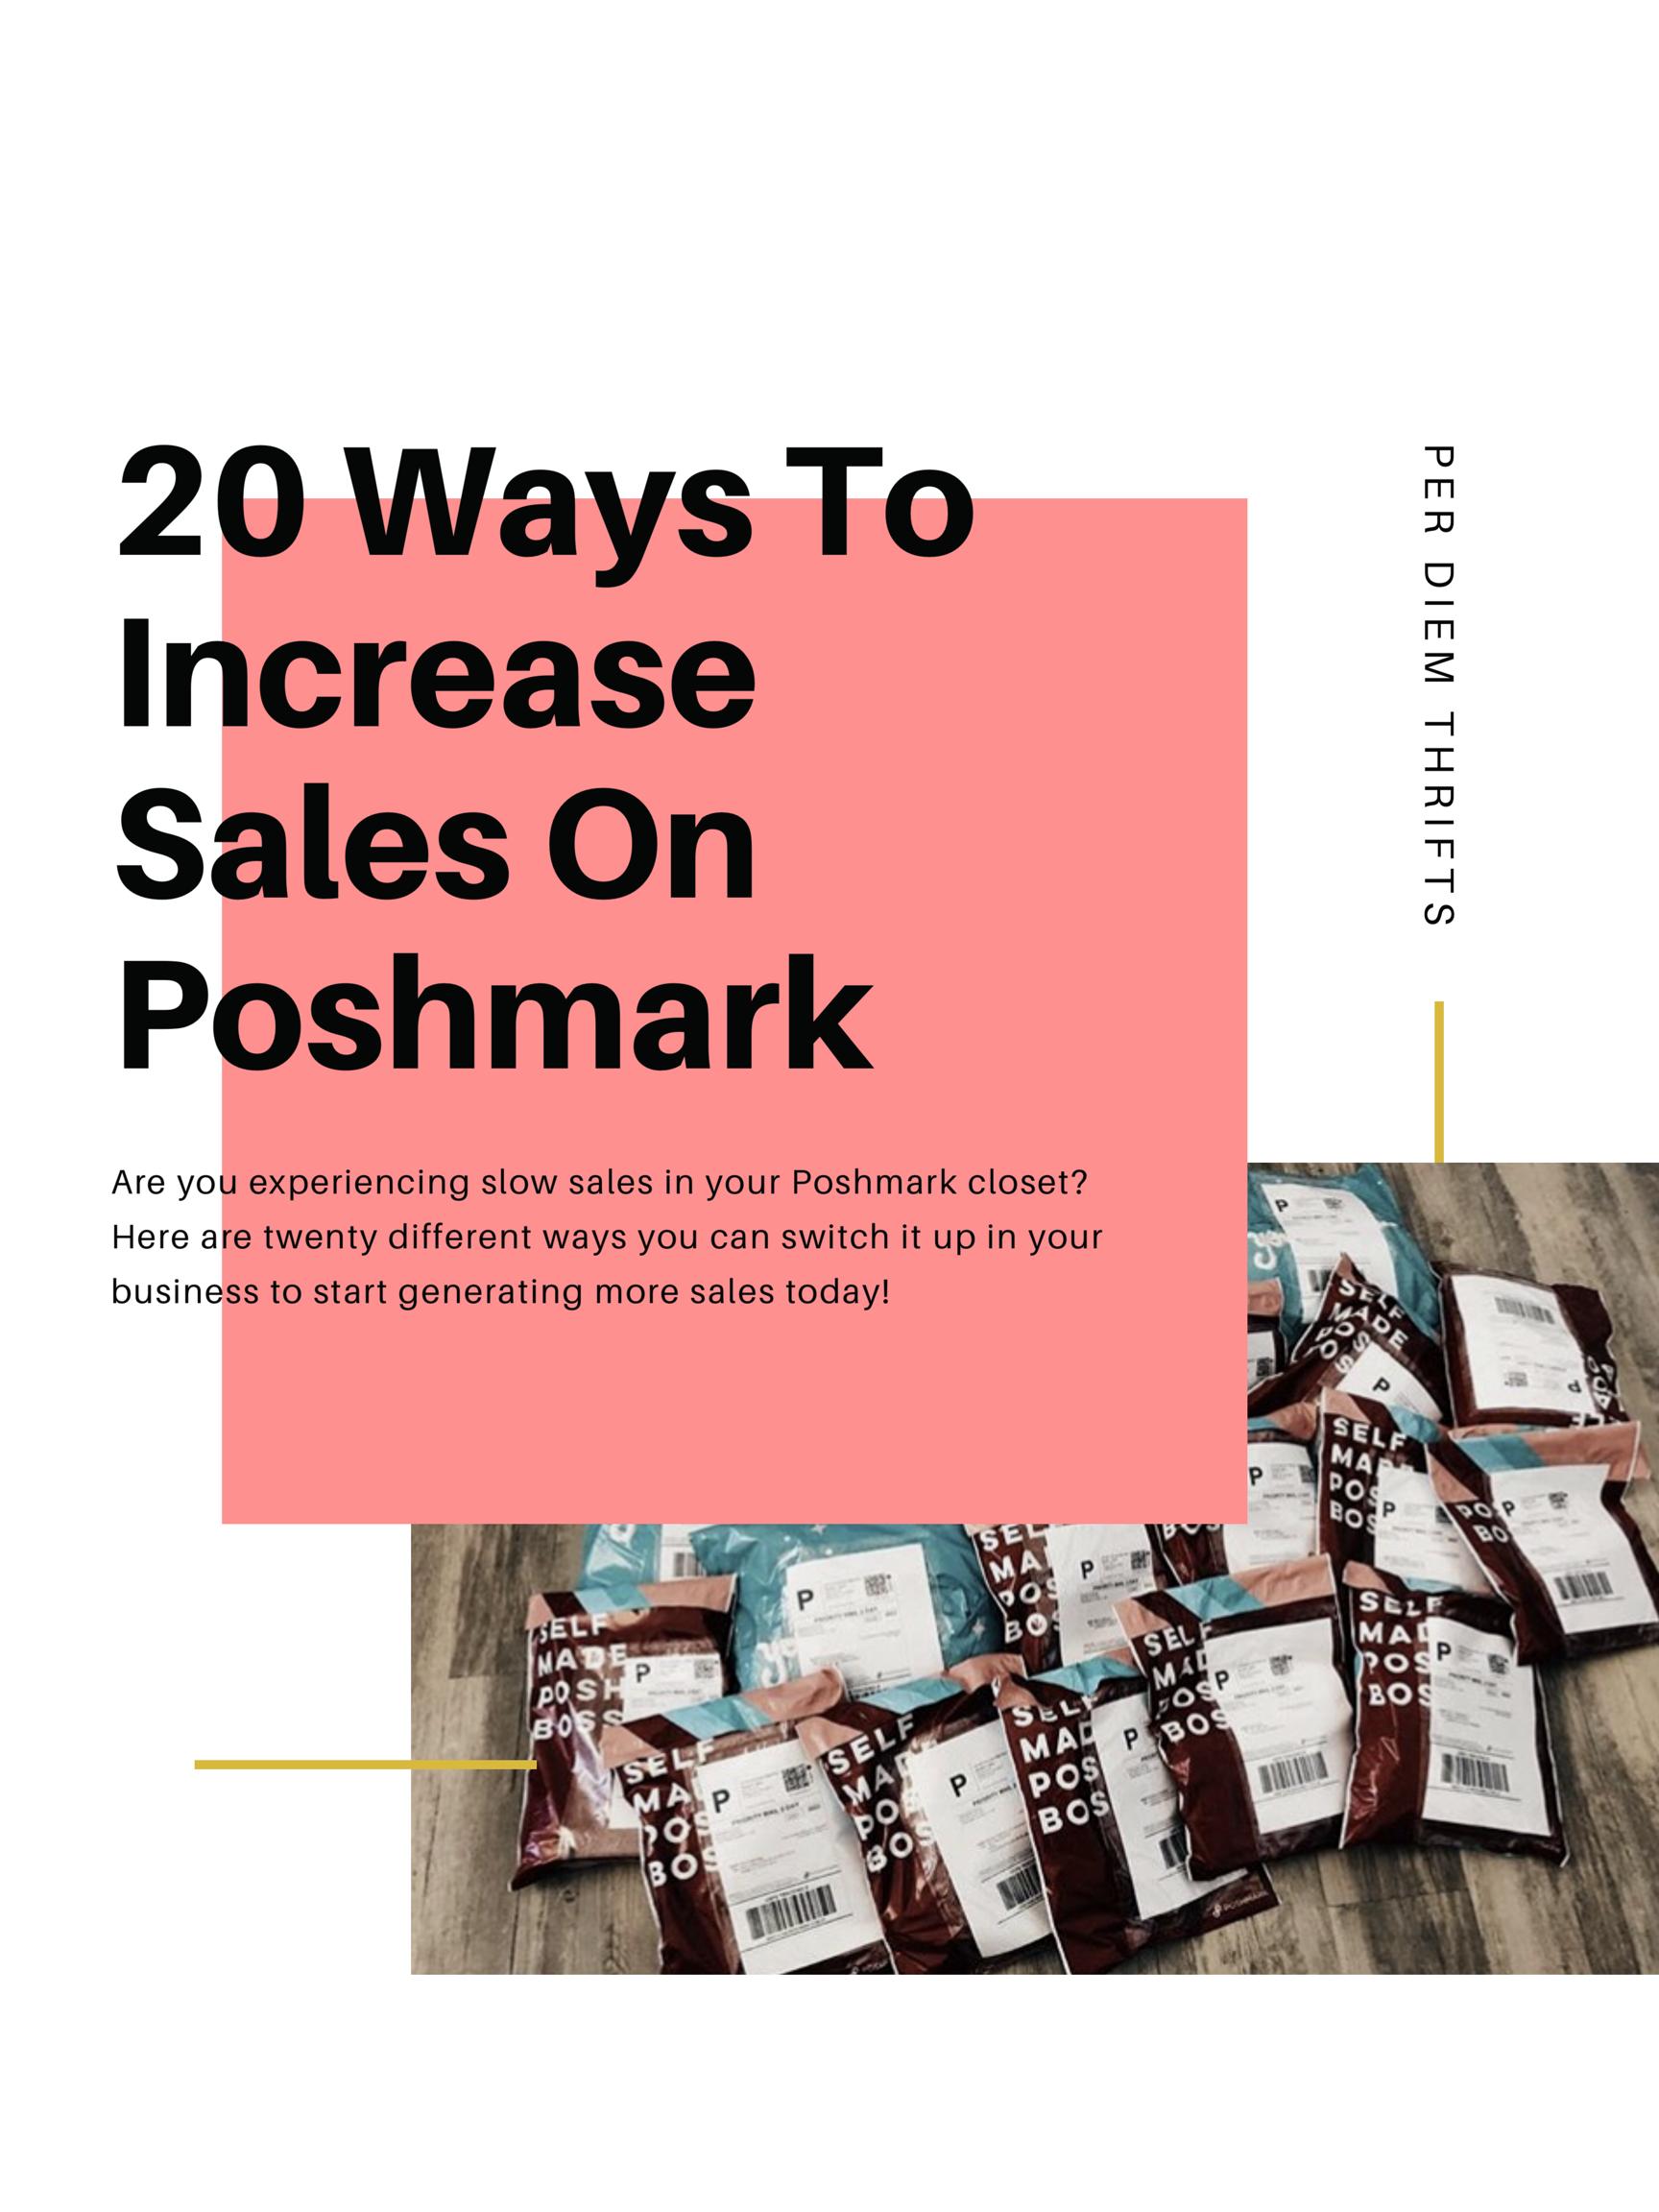 20 Ways to Increase your Poshmark Sales | Per Diem Thrifts